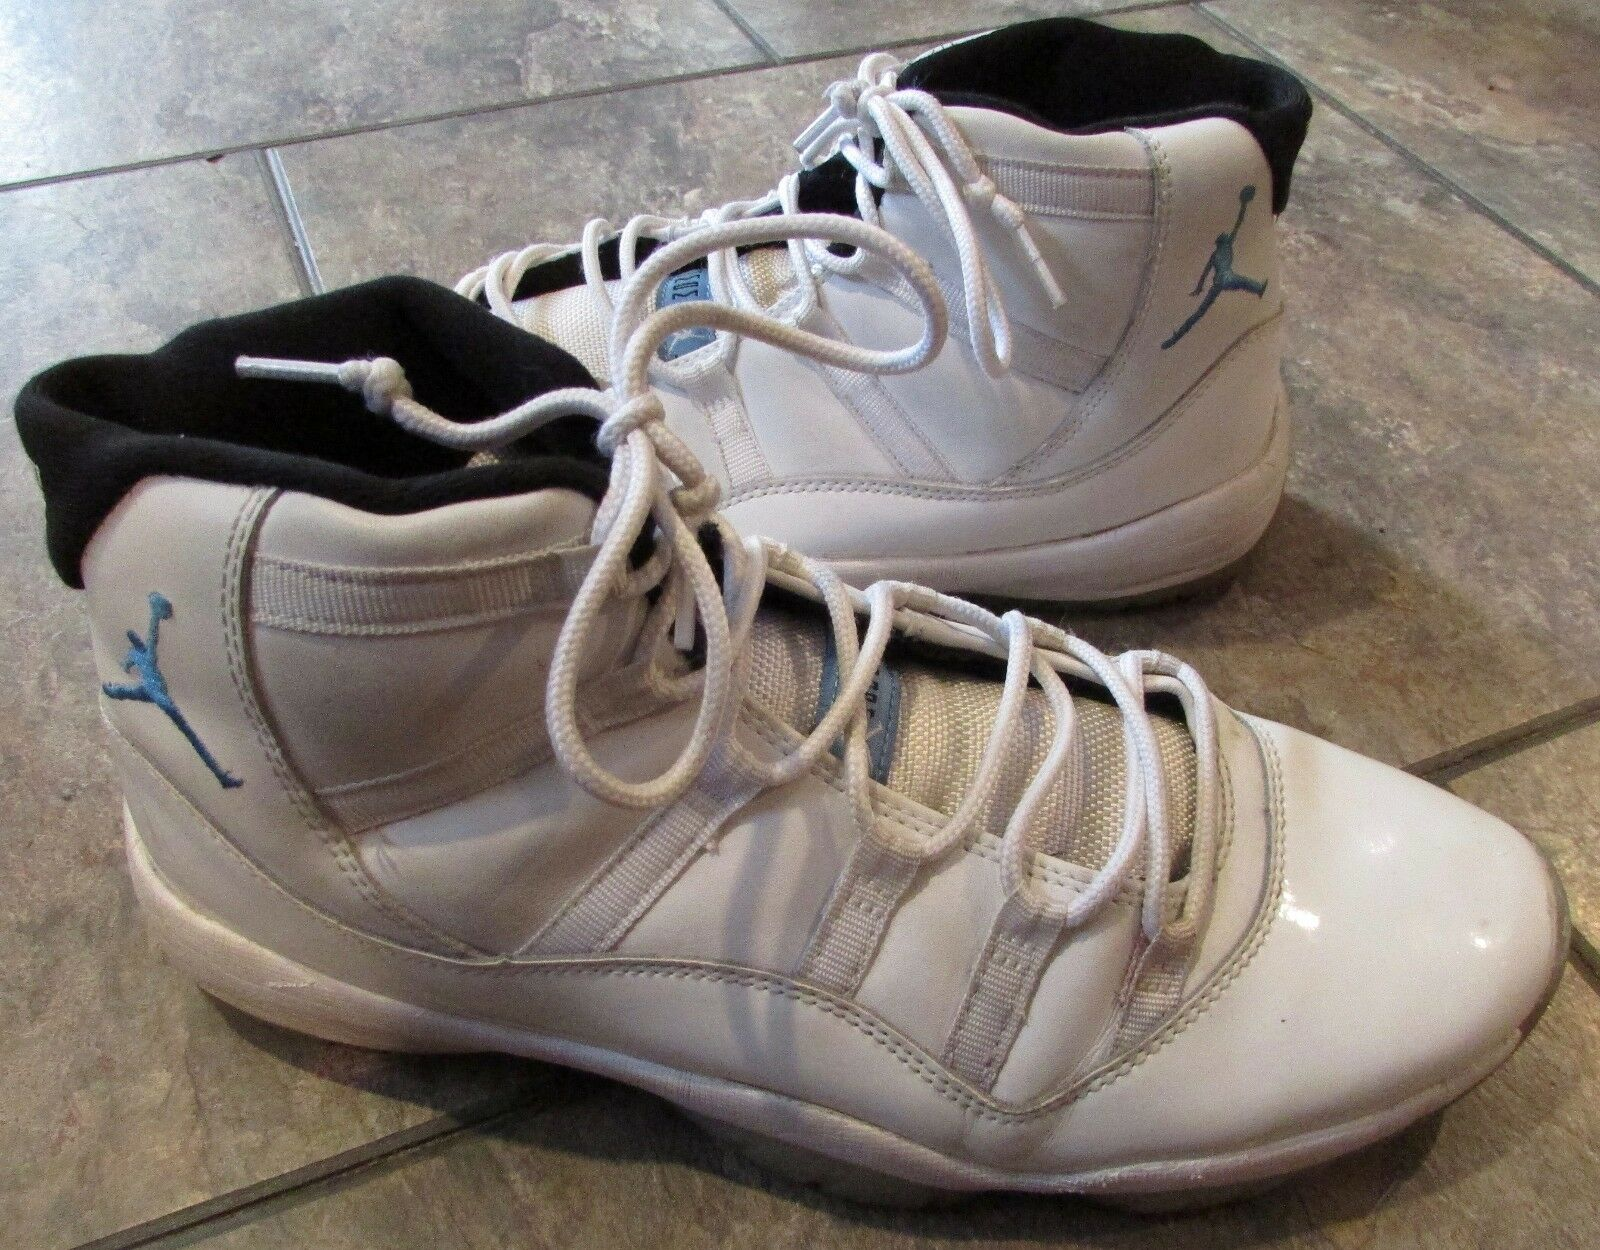 Air Jordan 11 Retro White/Legend Blue Size 11